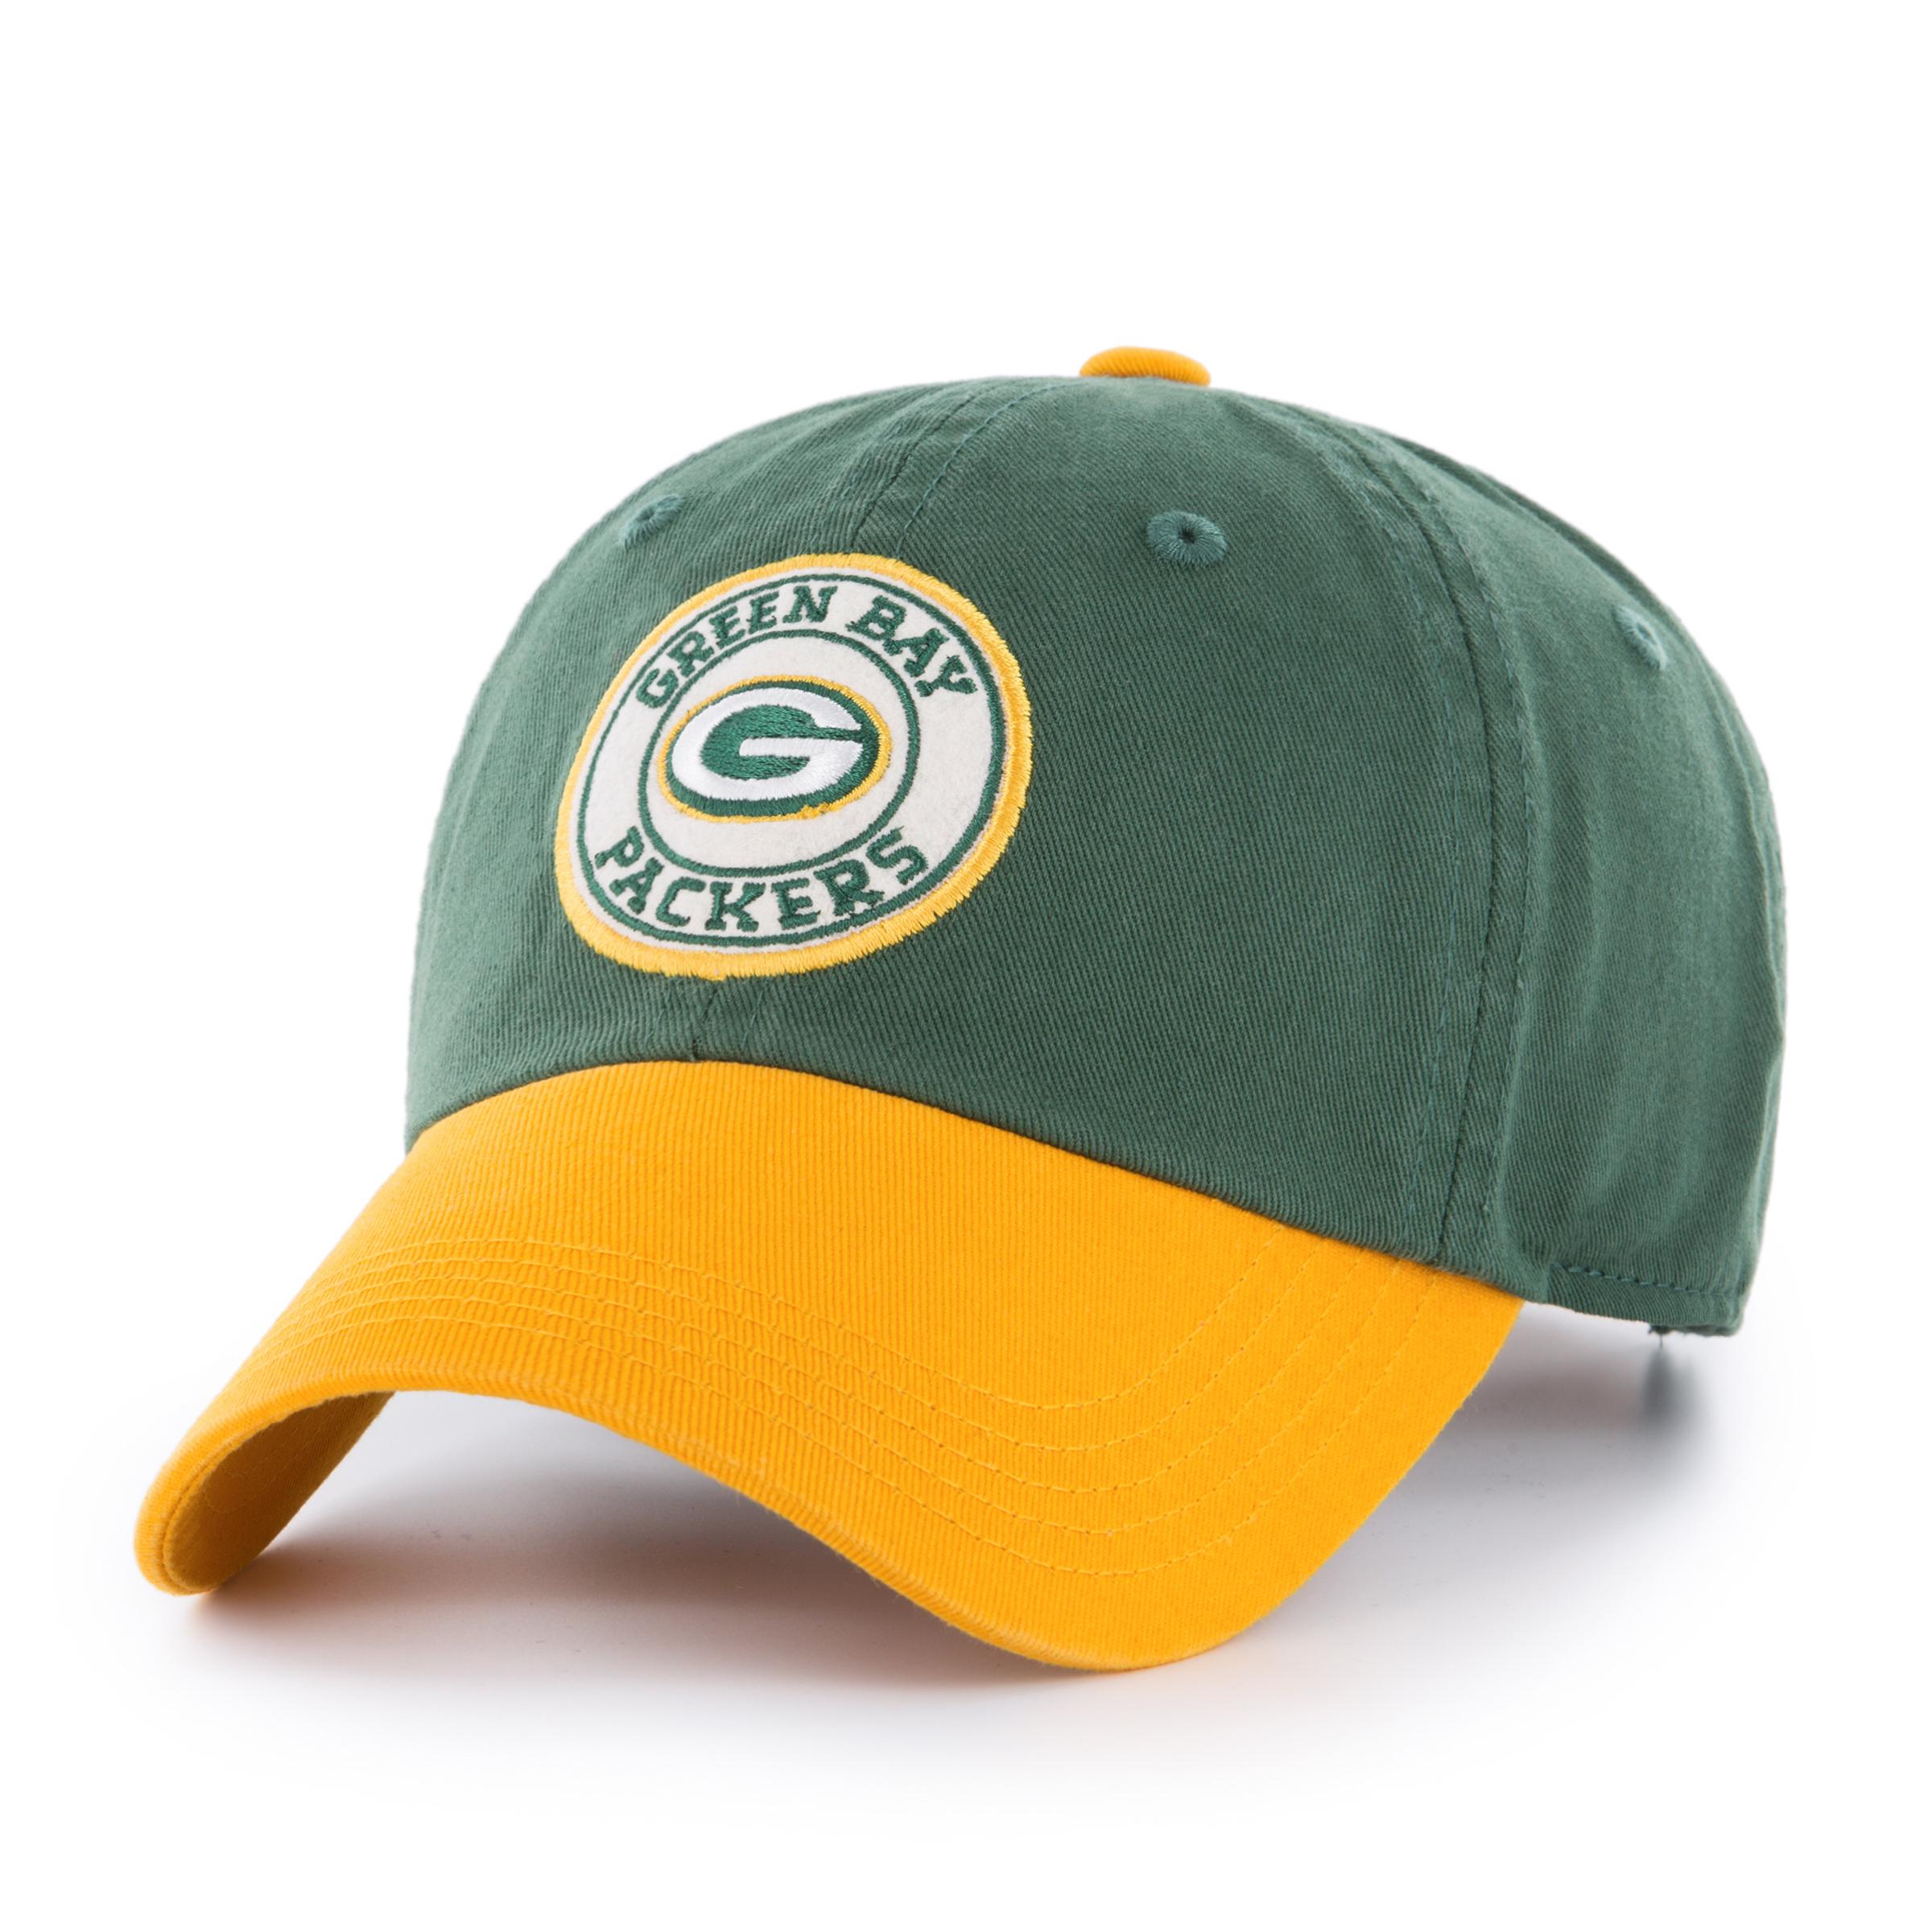 NFL Kids Baseball Cap Green Bay Packers